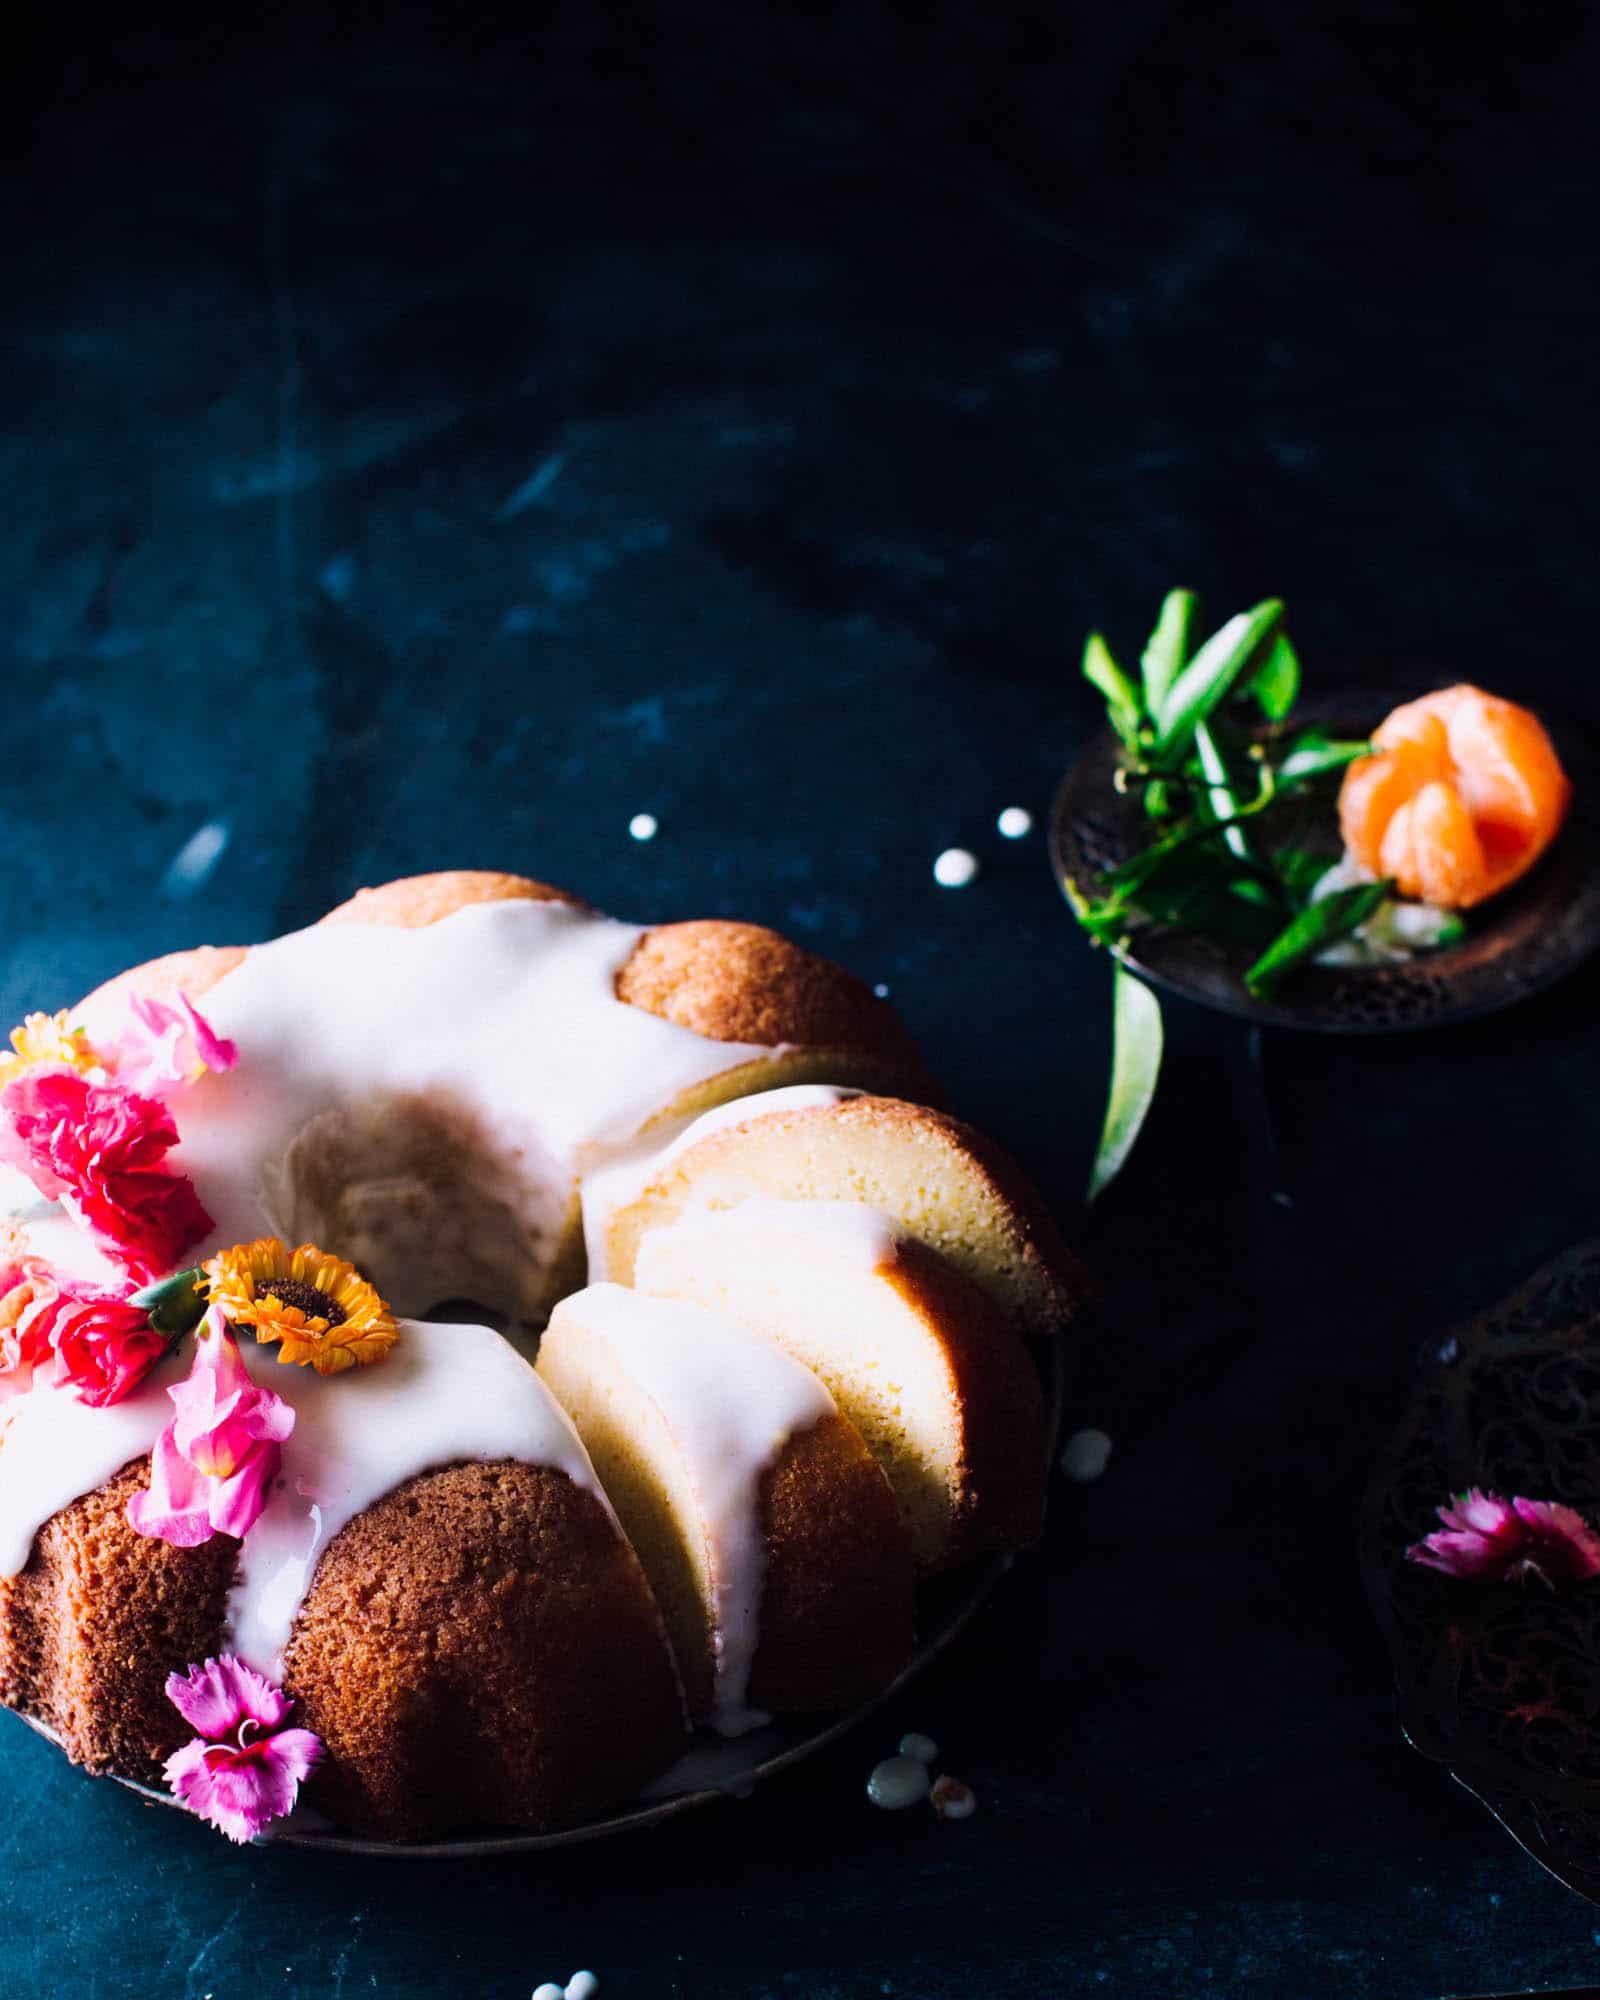 orange pound cake with orange icing and flowers